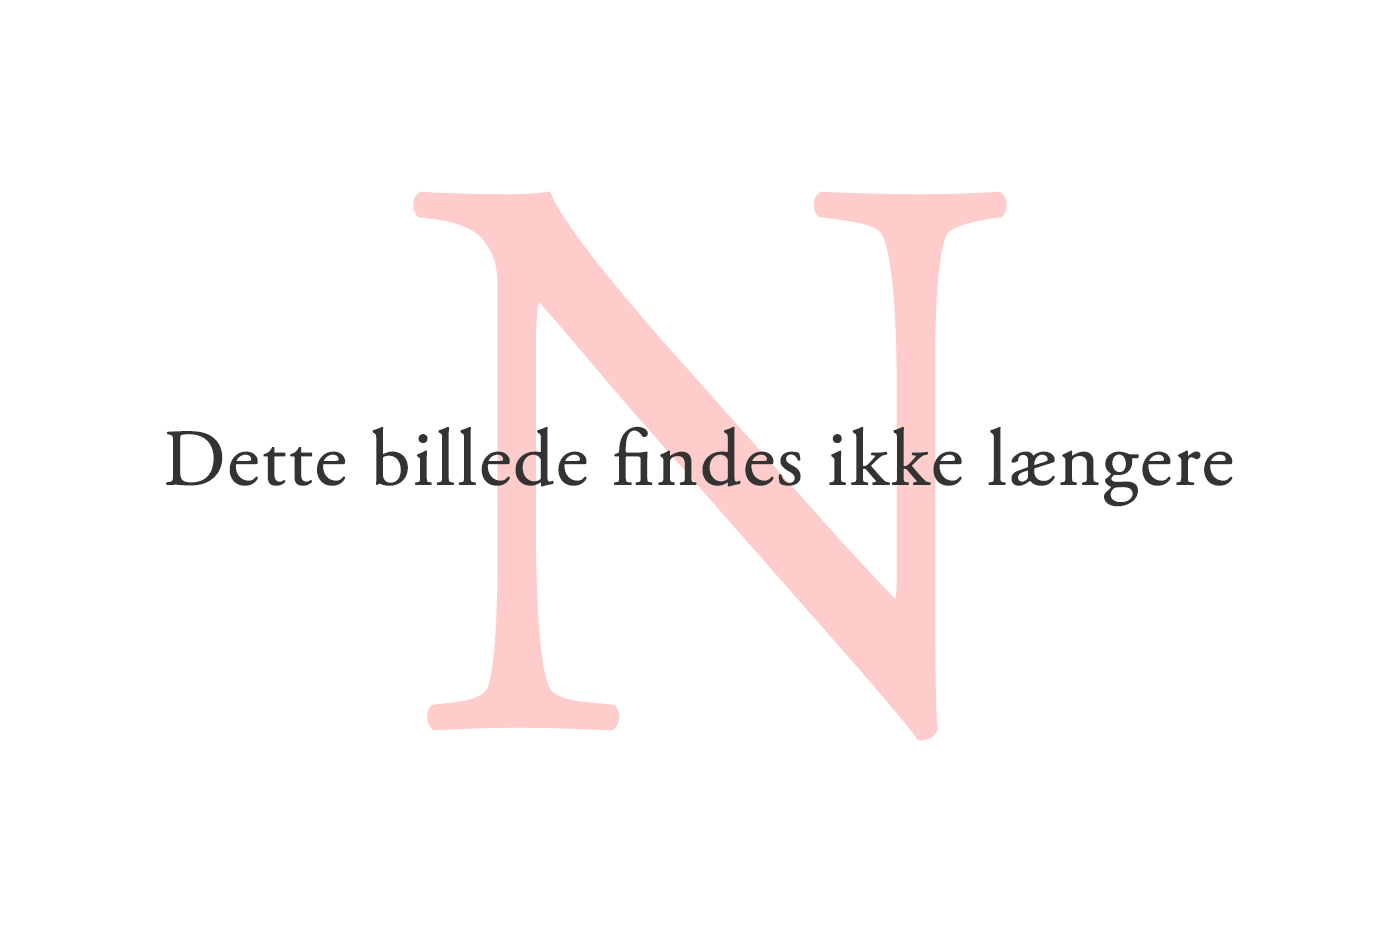 paradise hotel deltakere sex noveller.dk